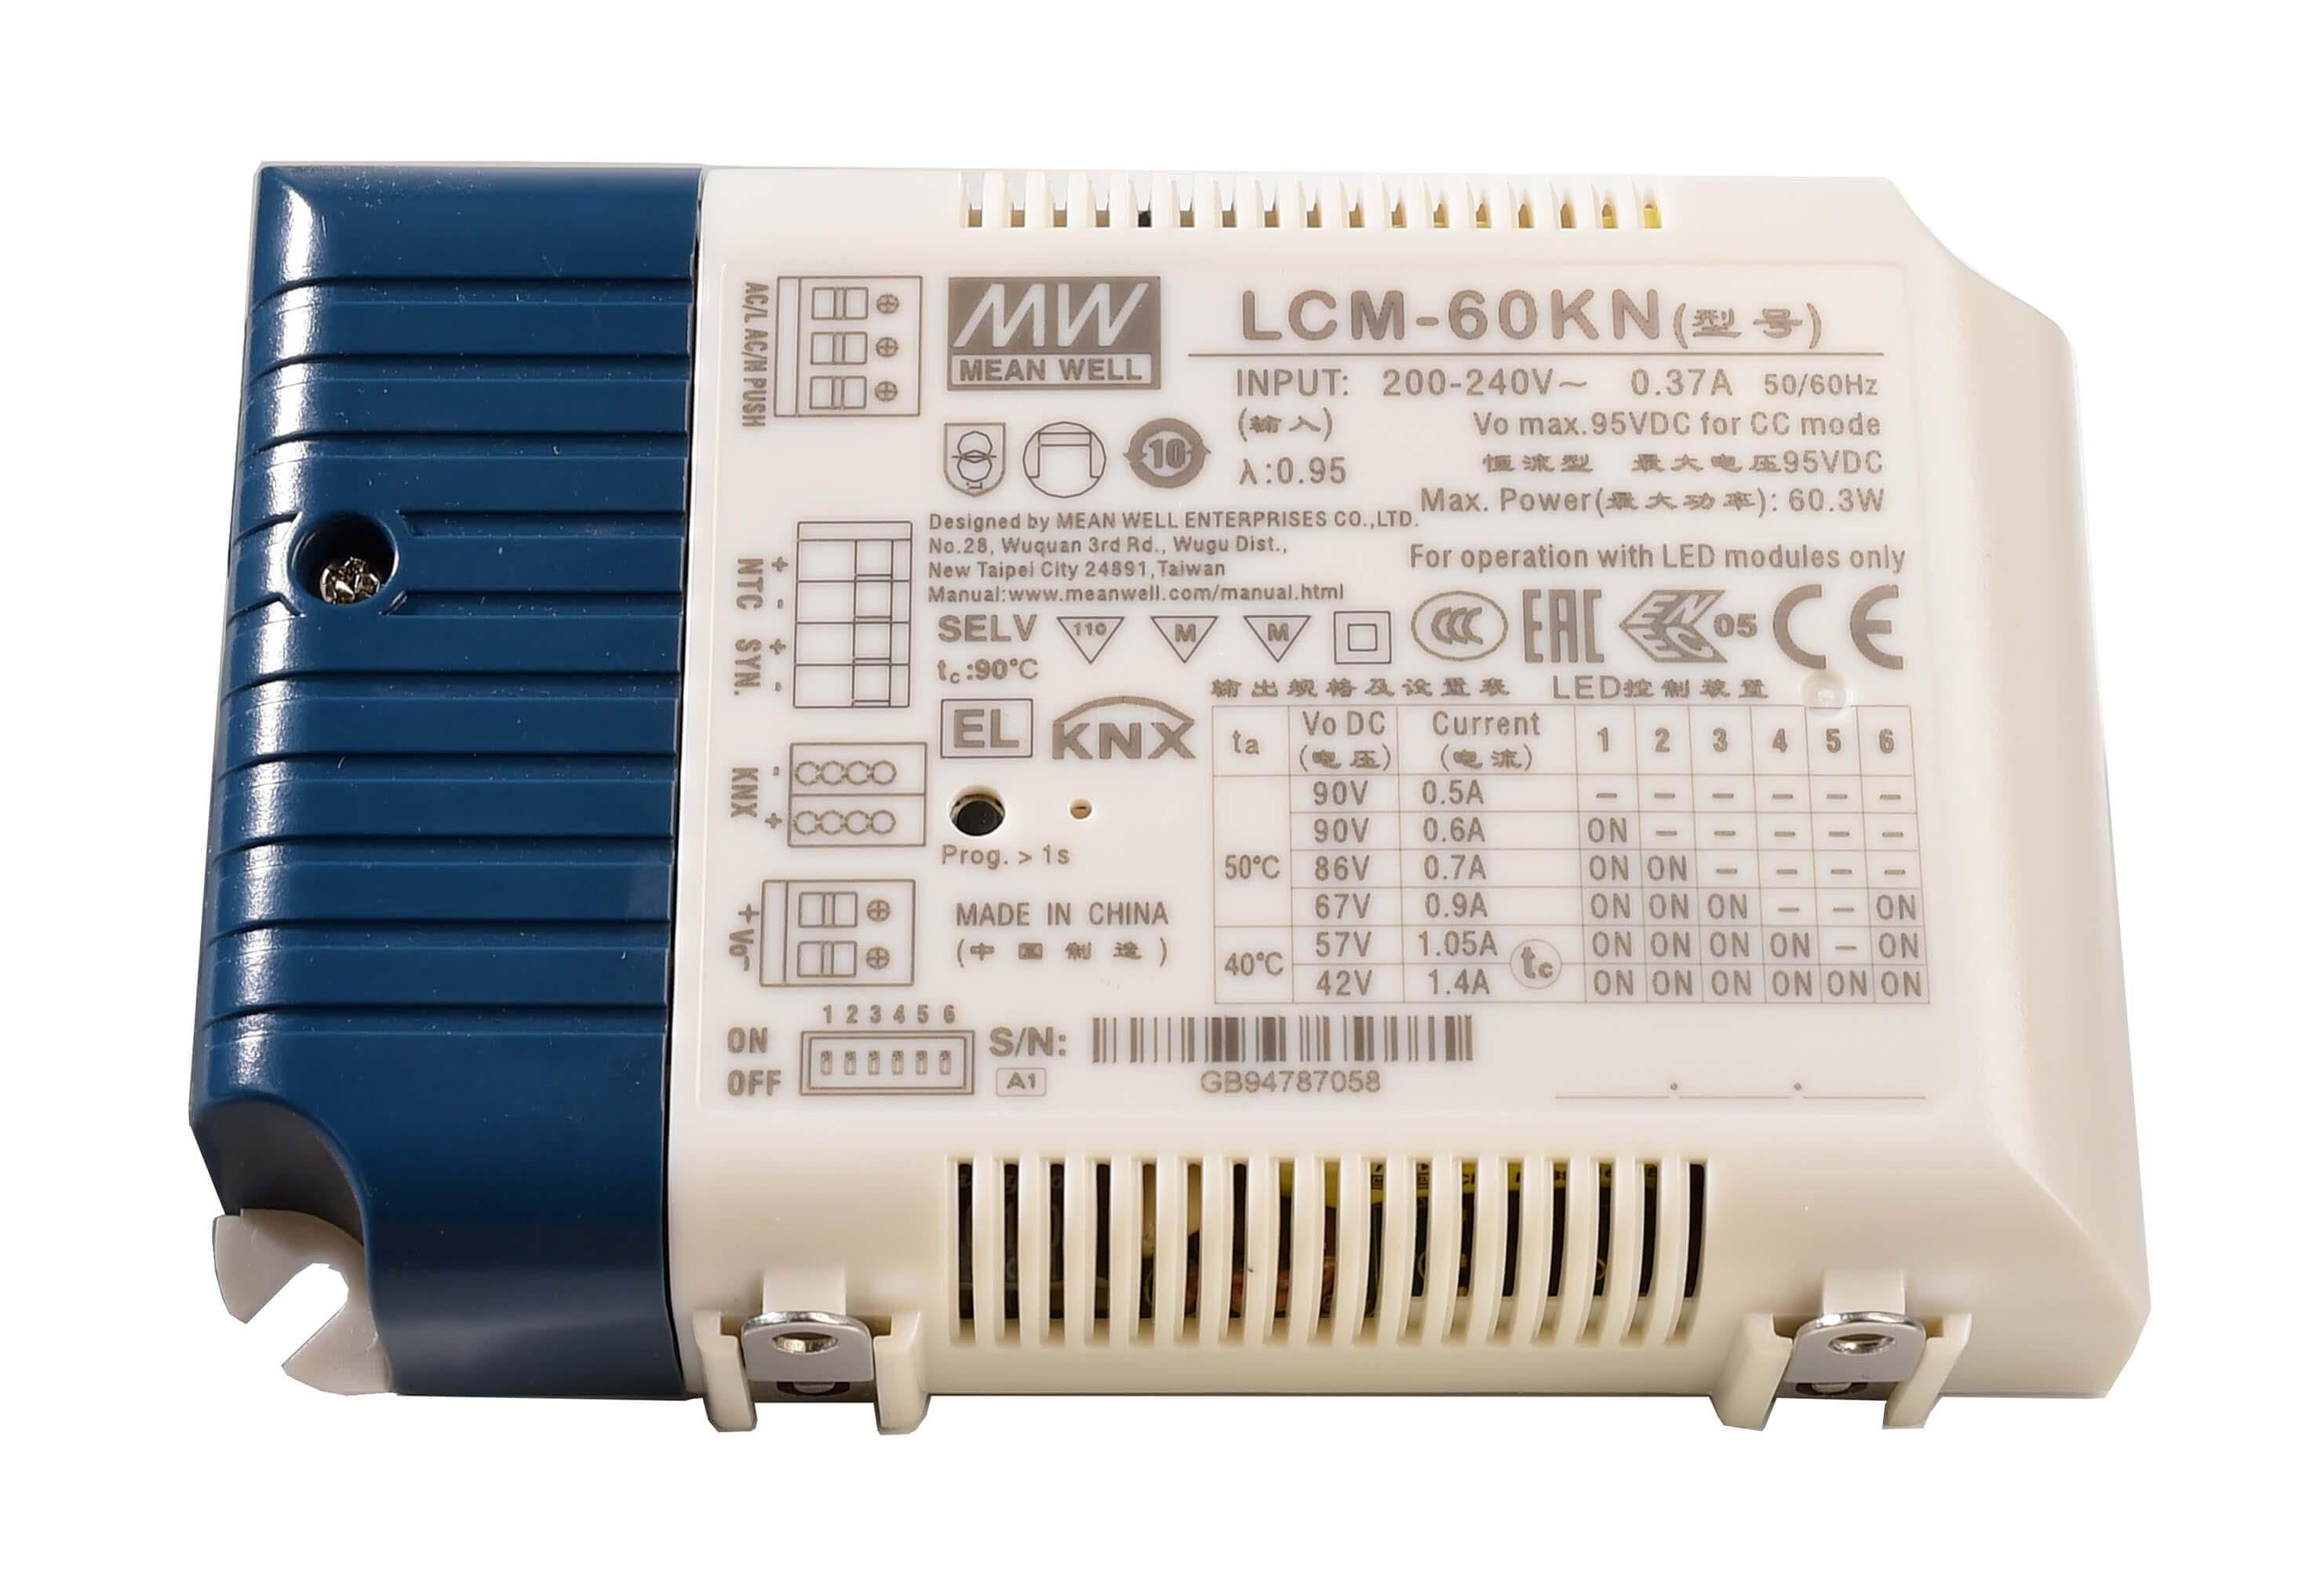 DIM, Multi CC, LCM-60KN - KNX